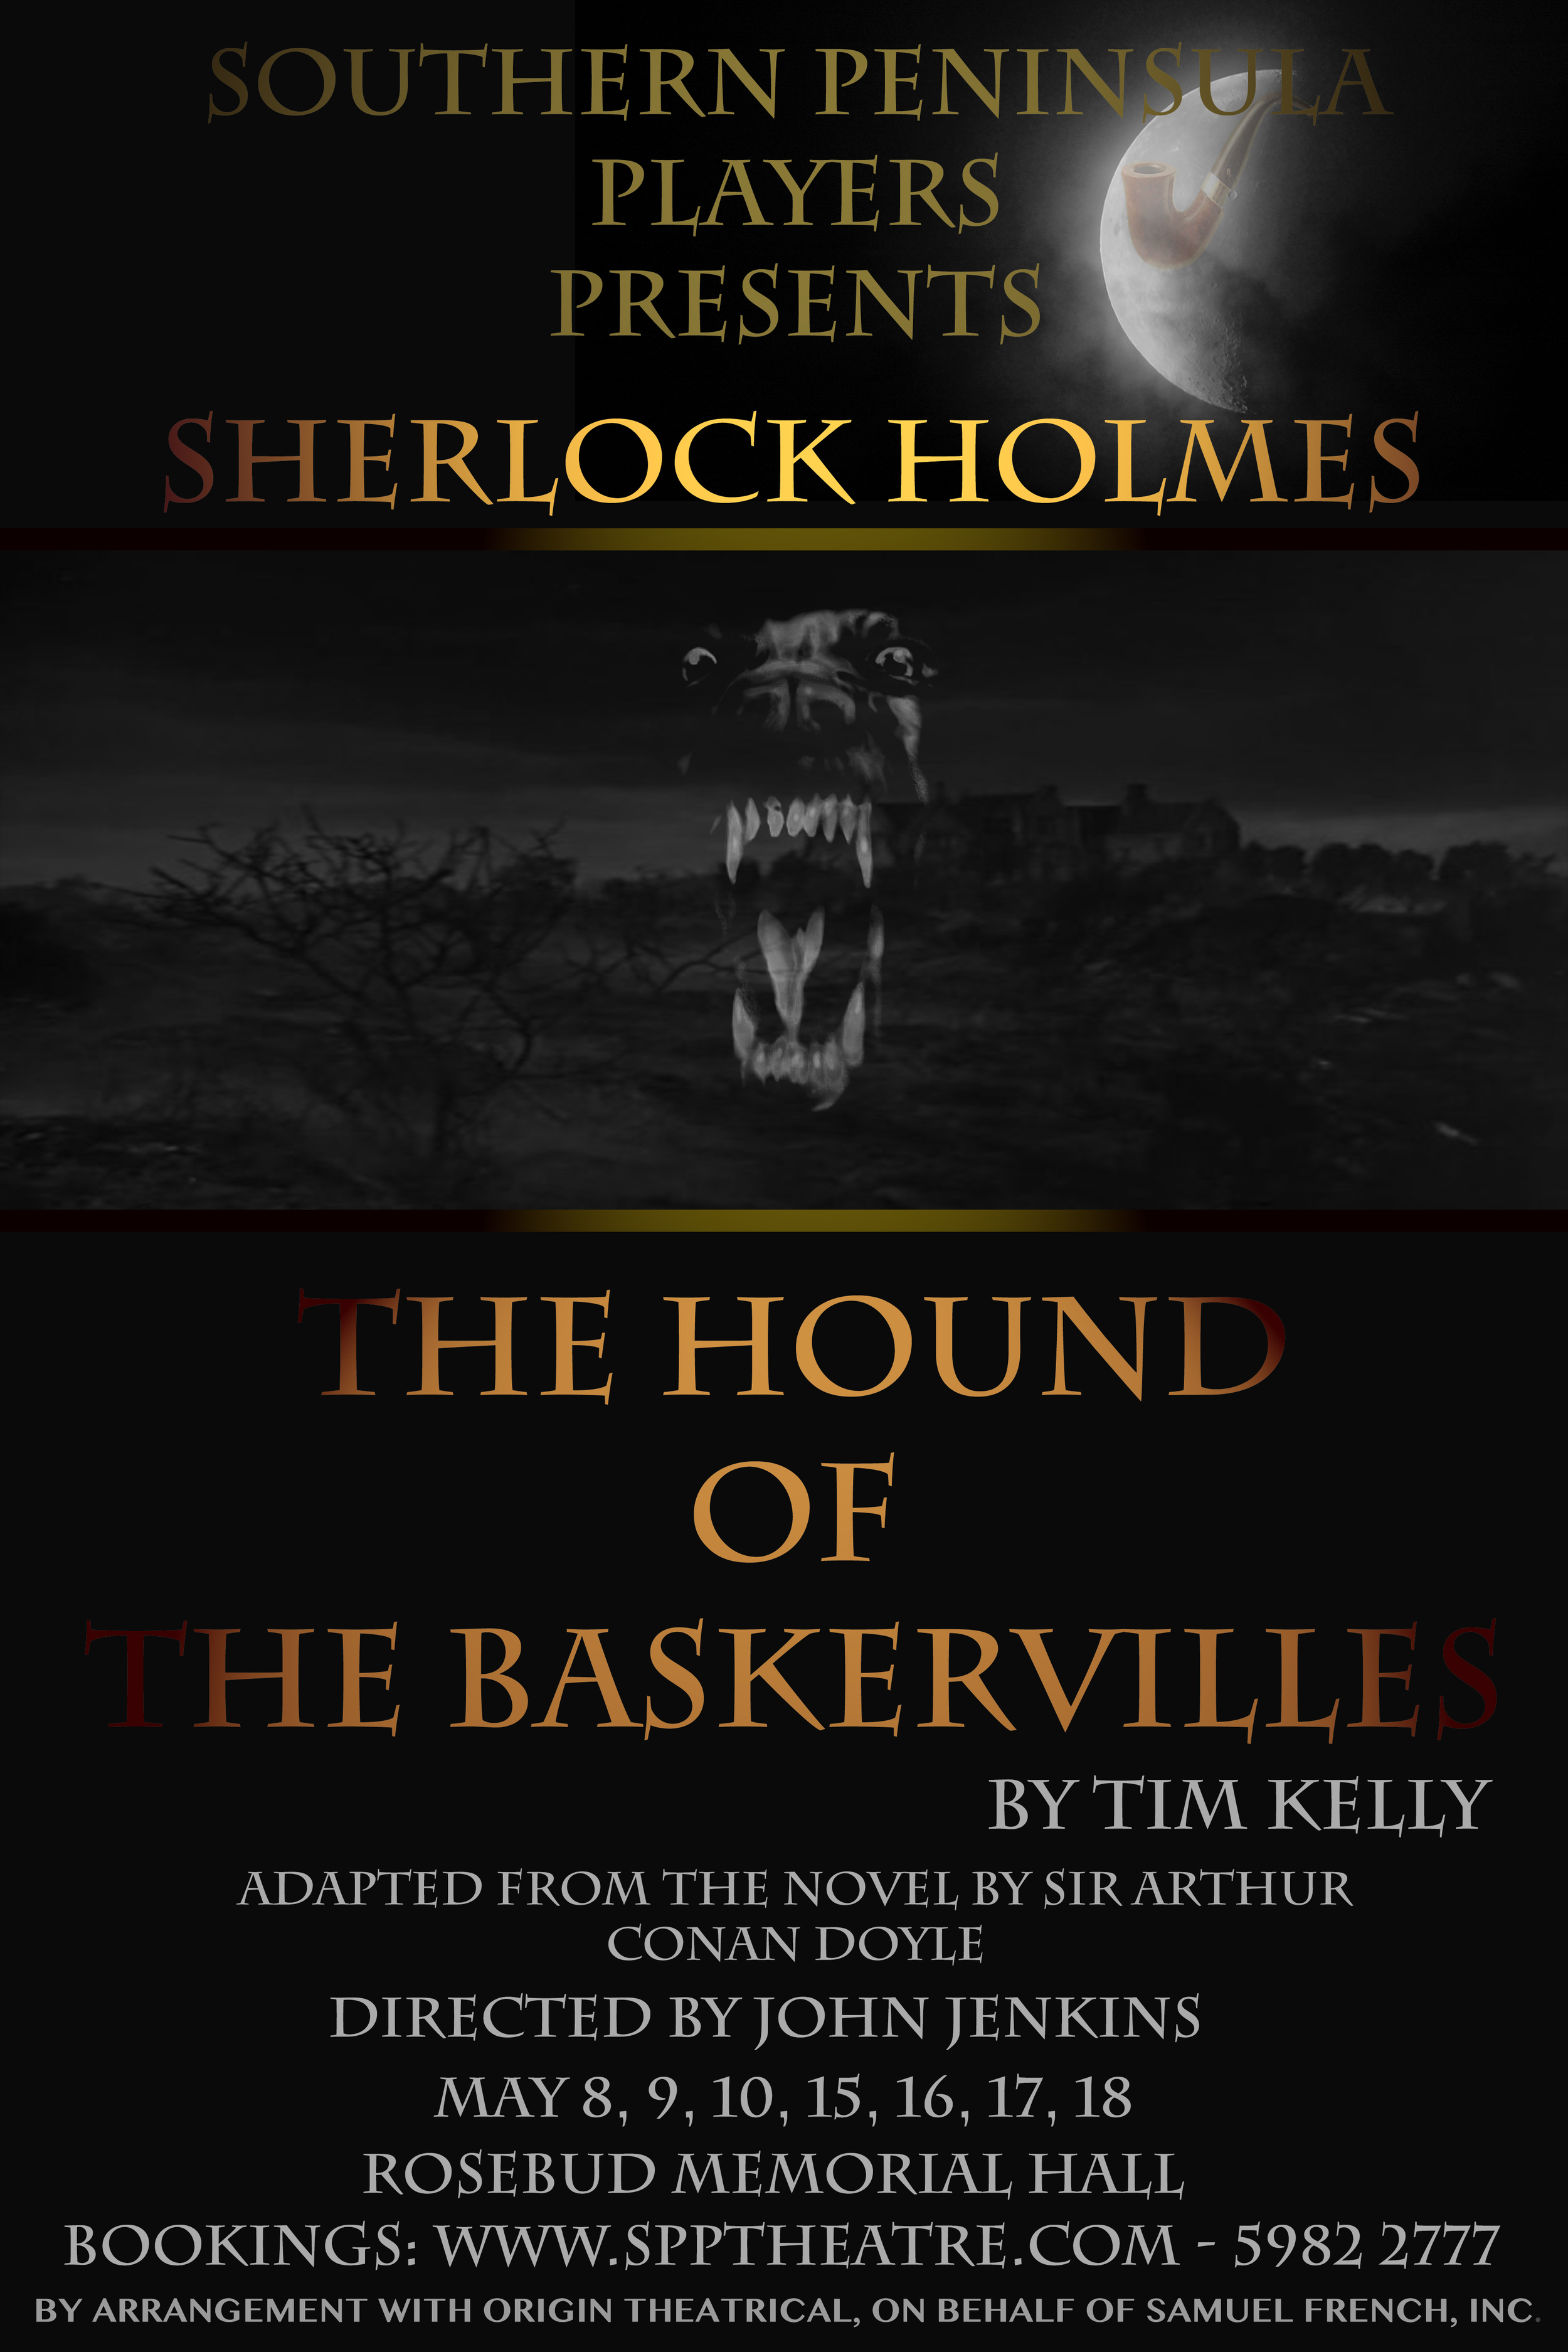 Hound of the Baskervilles A4.jpg